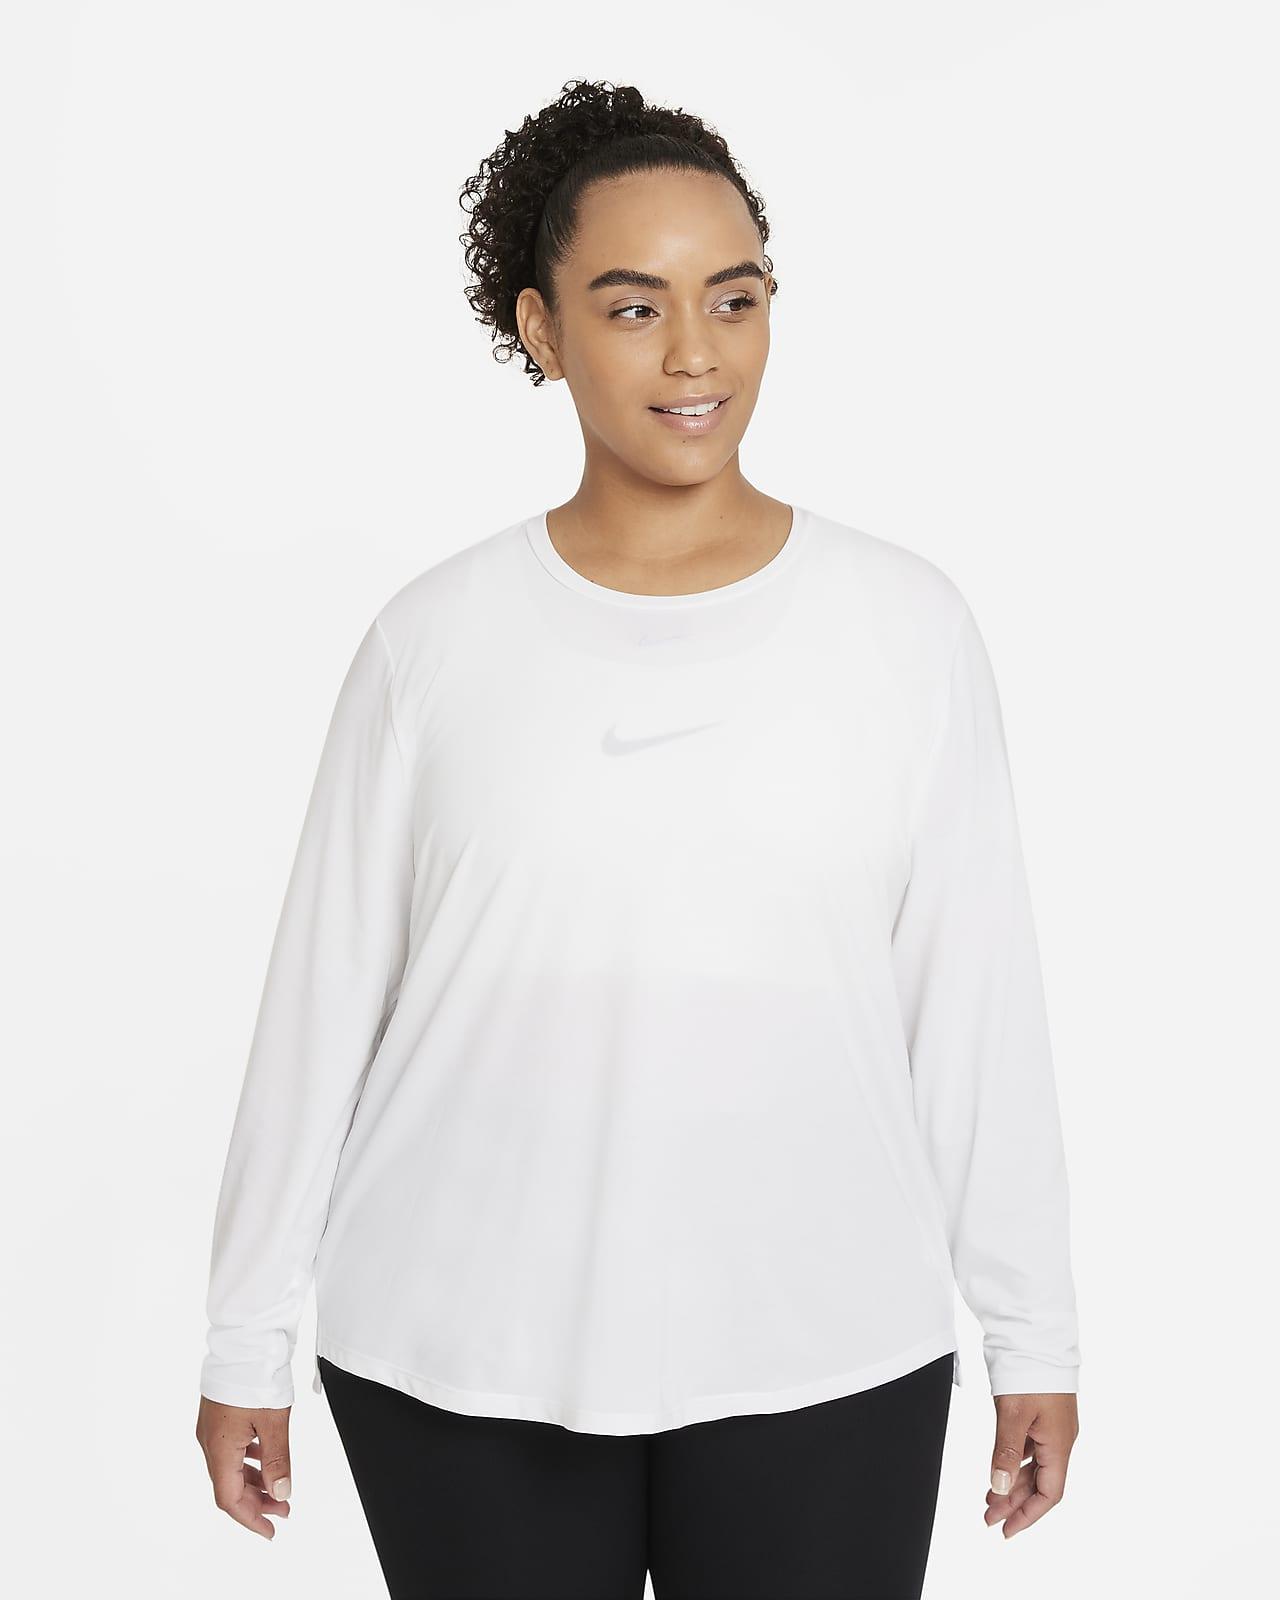 Nike Dri-FIT One Luxe Women's Standard Fit Long-Sleeve Top (Plus Size)